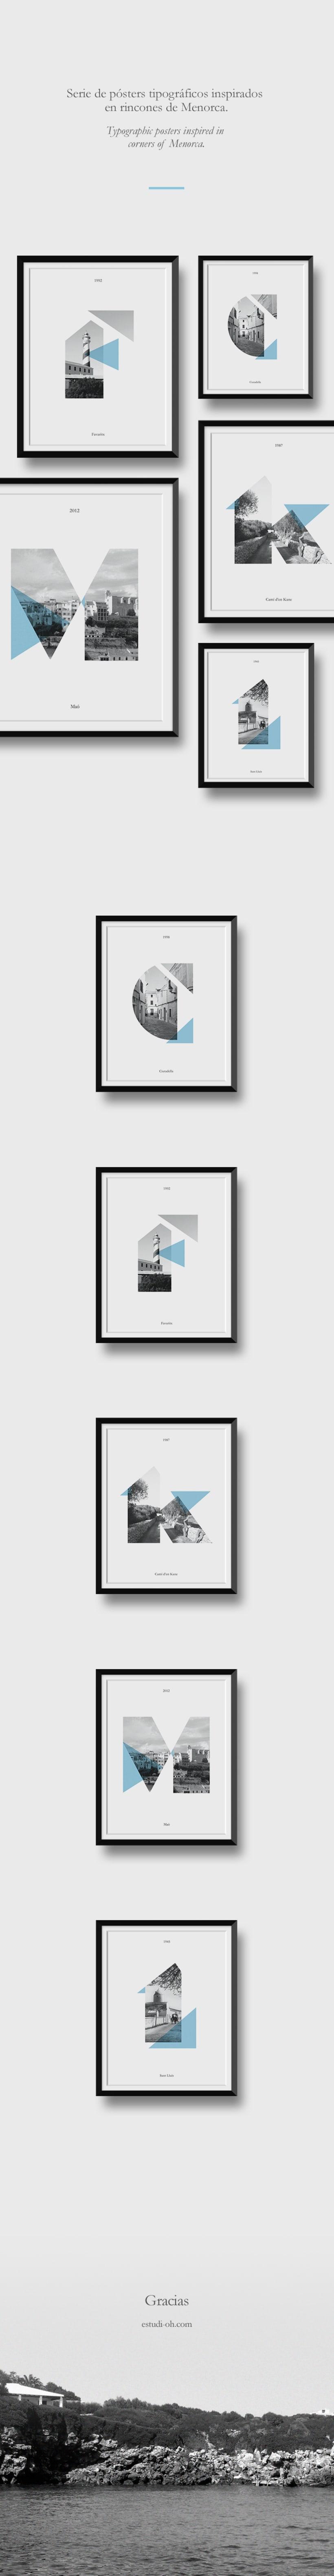 Pósters Serie tipográfica  Menorca 0